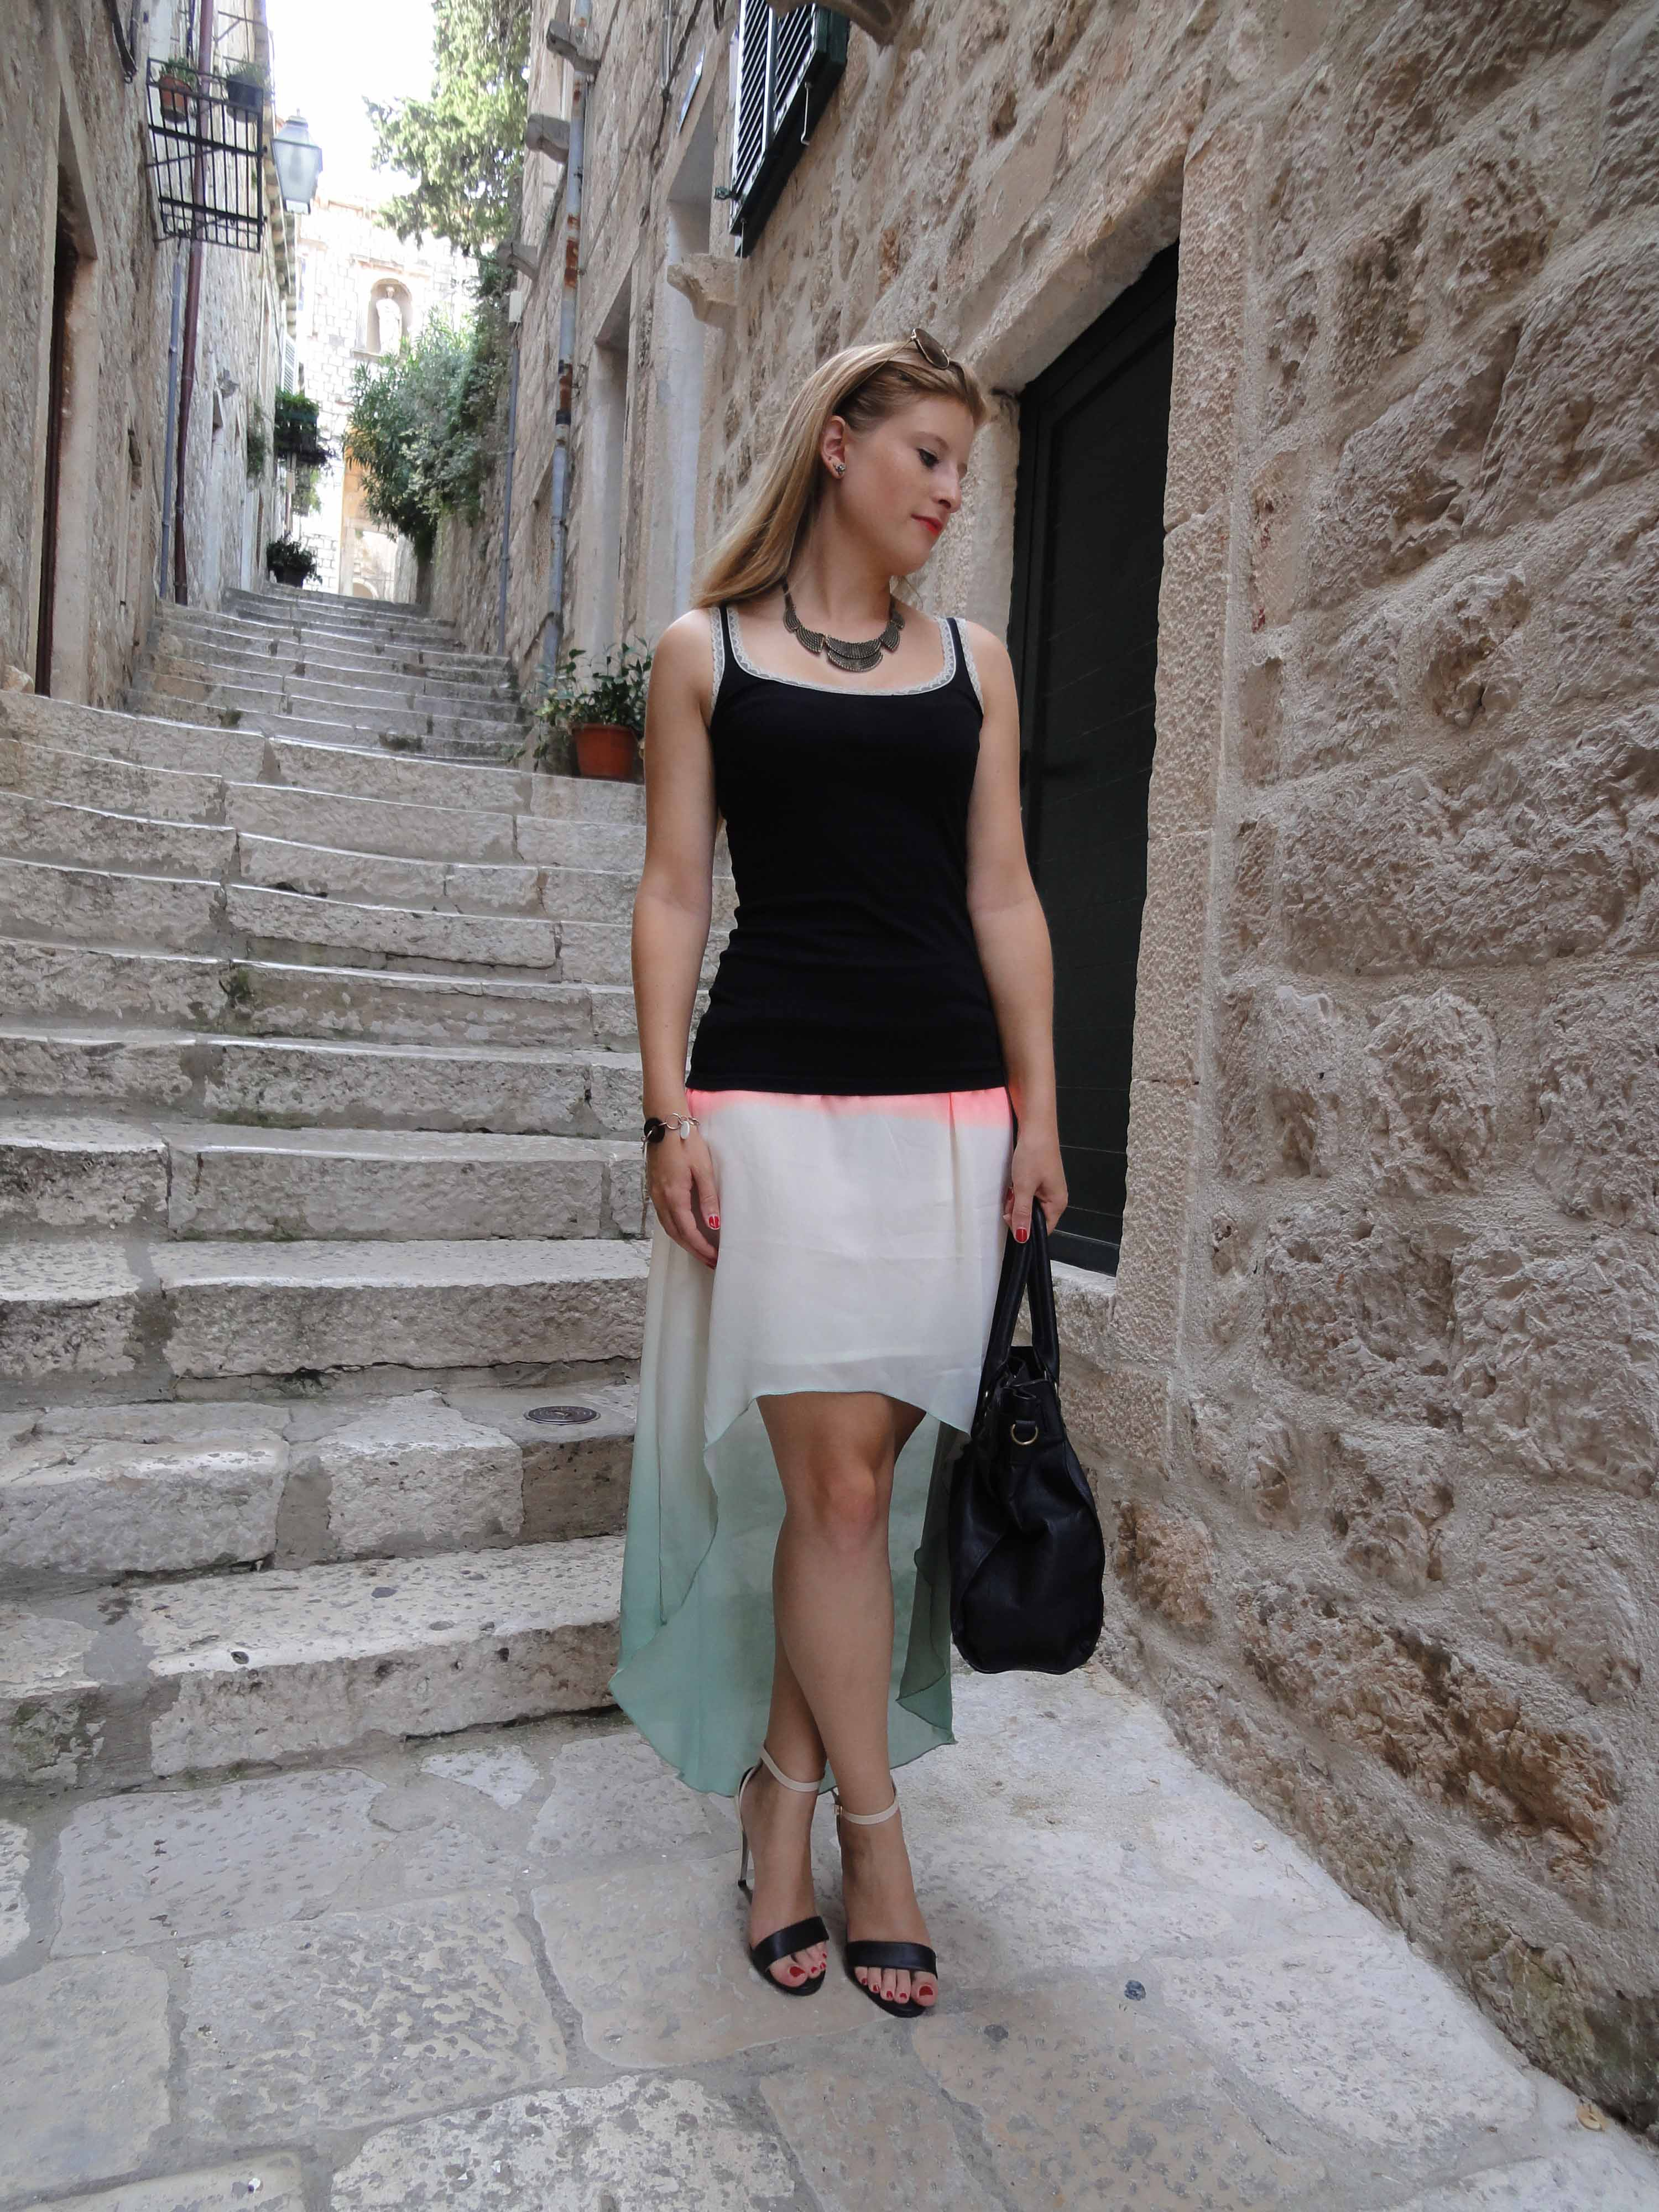 Mullet Skirt Vokuhila Rock kombinieren Sommeroutfit Fashion Look Dubrovnik Pilotensonnenbrille Modeblog 2